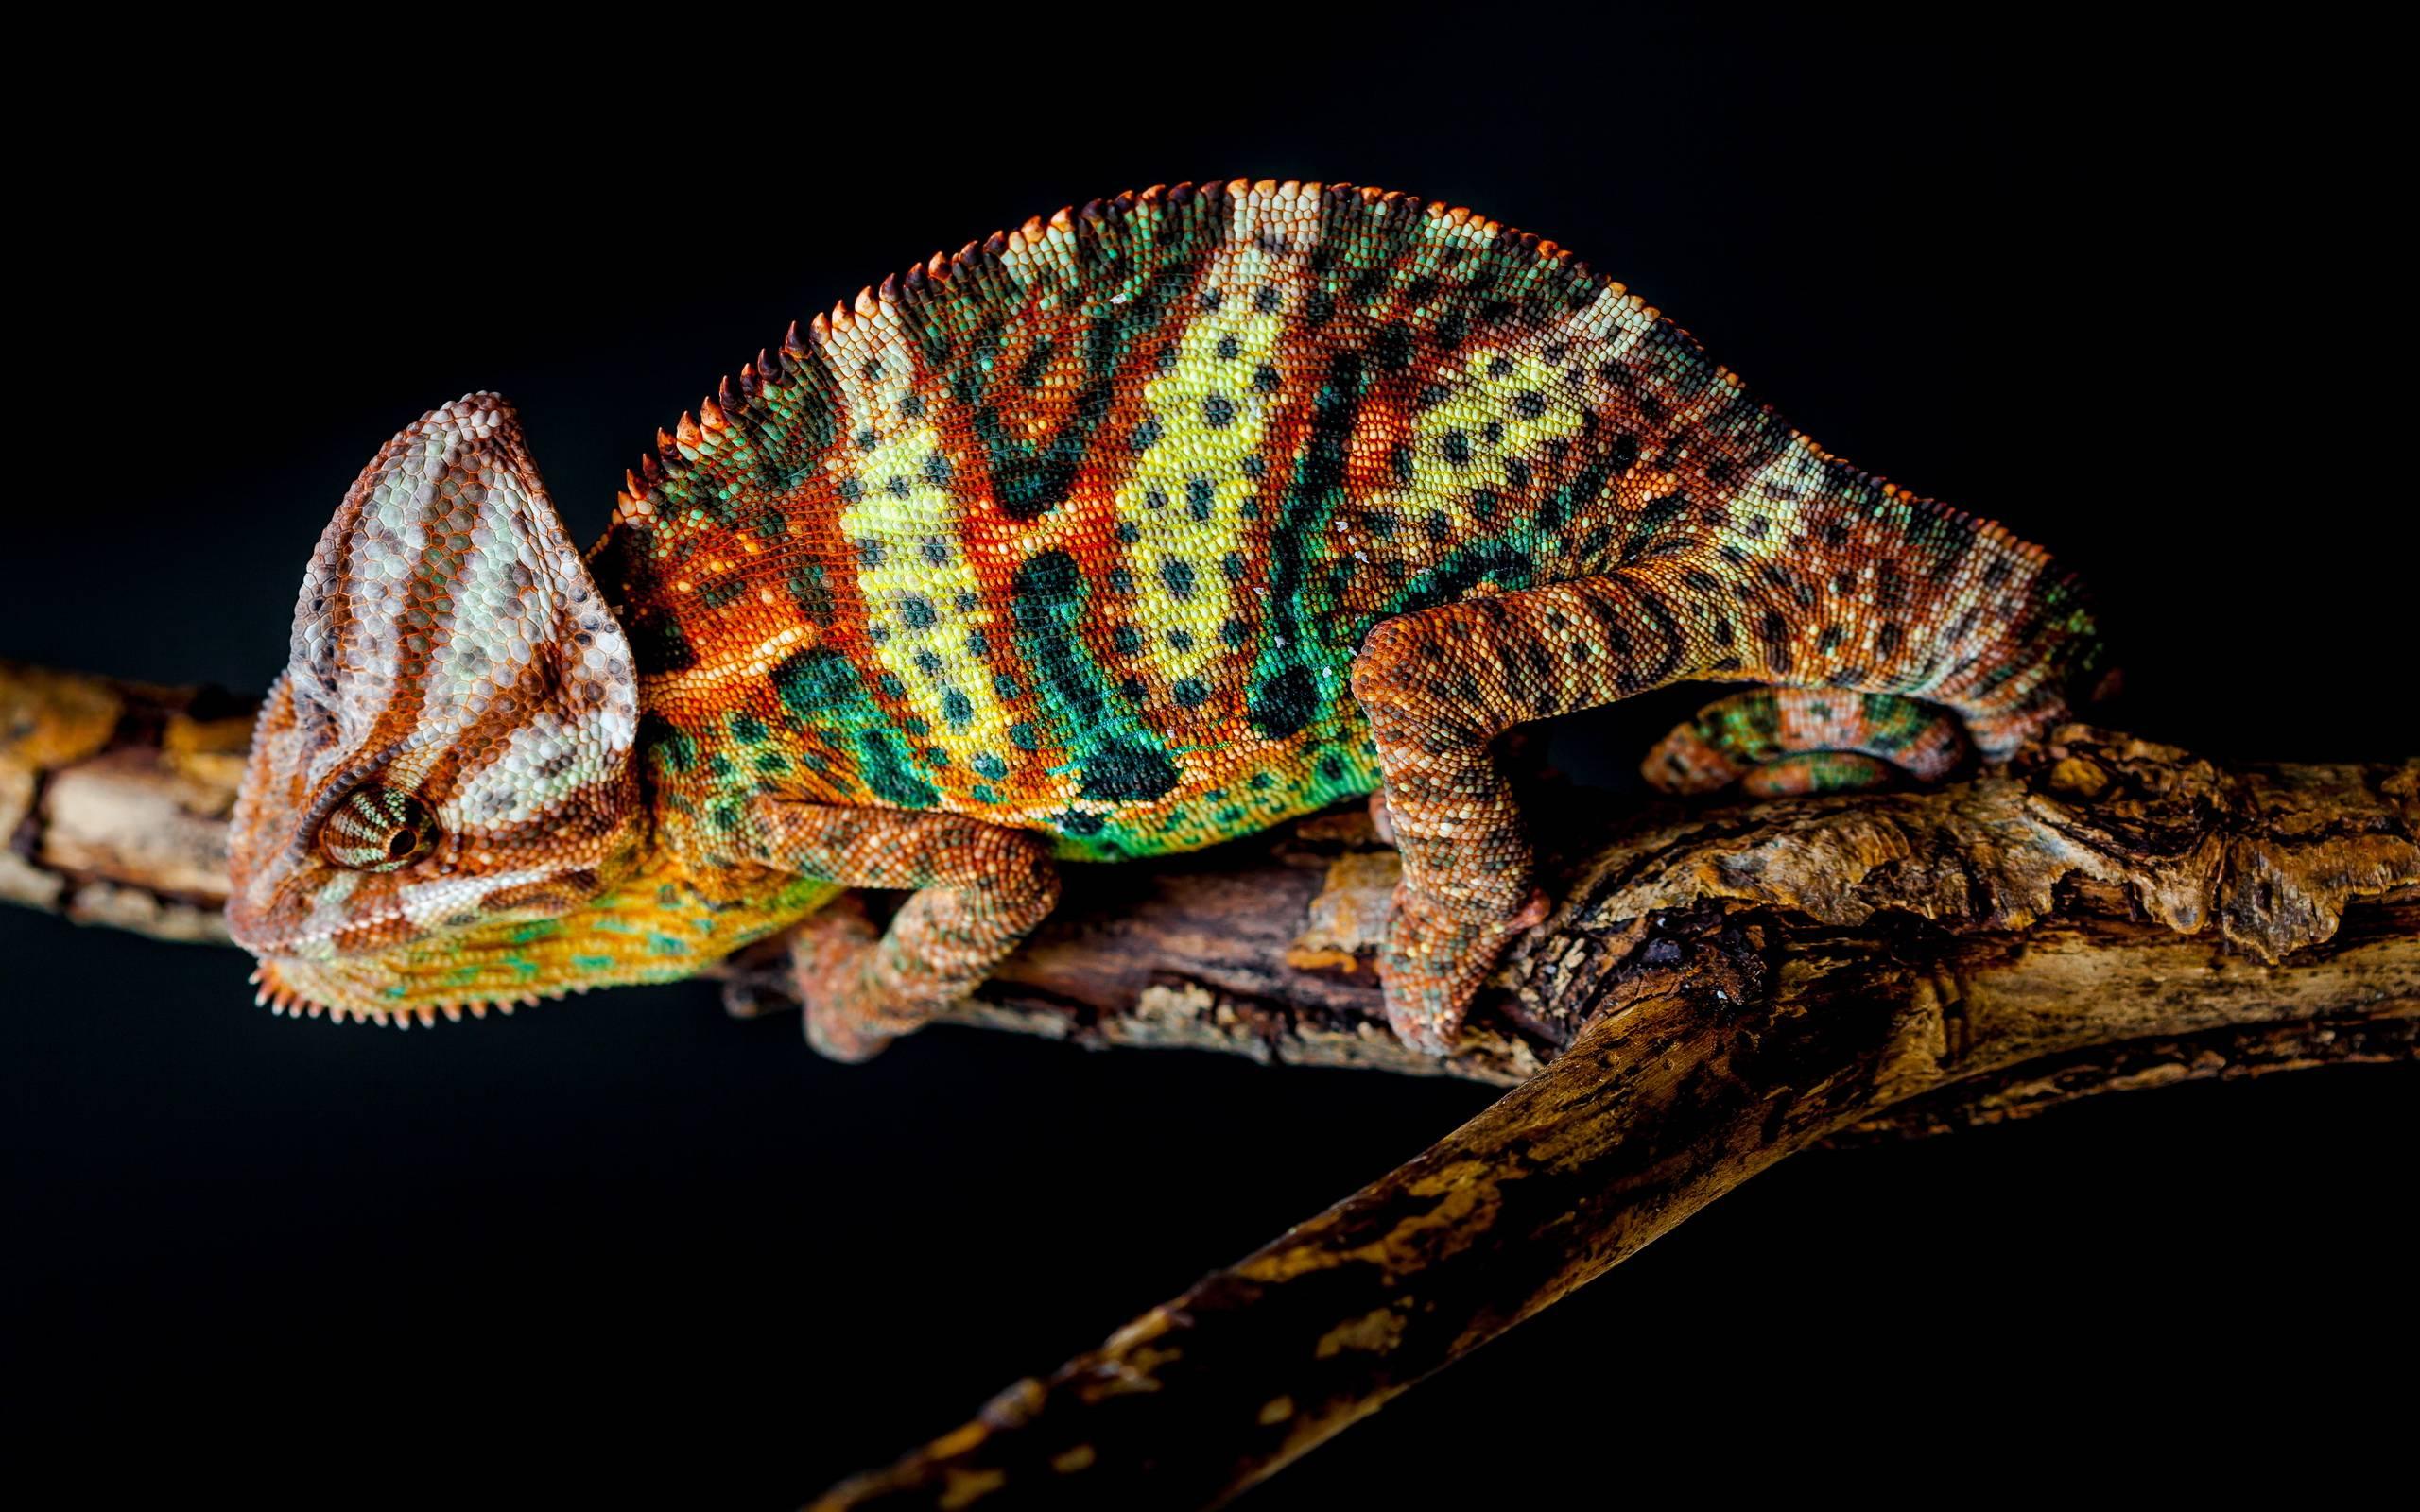 chameleon wallpaper 9661 - photo #4